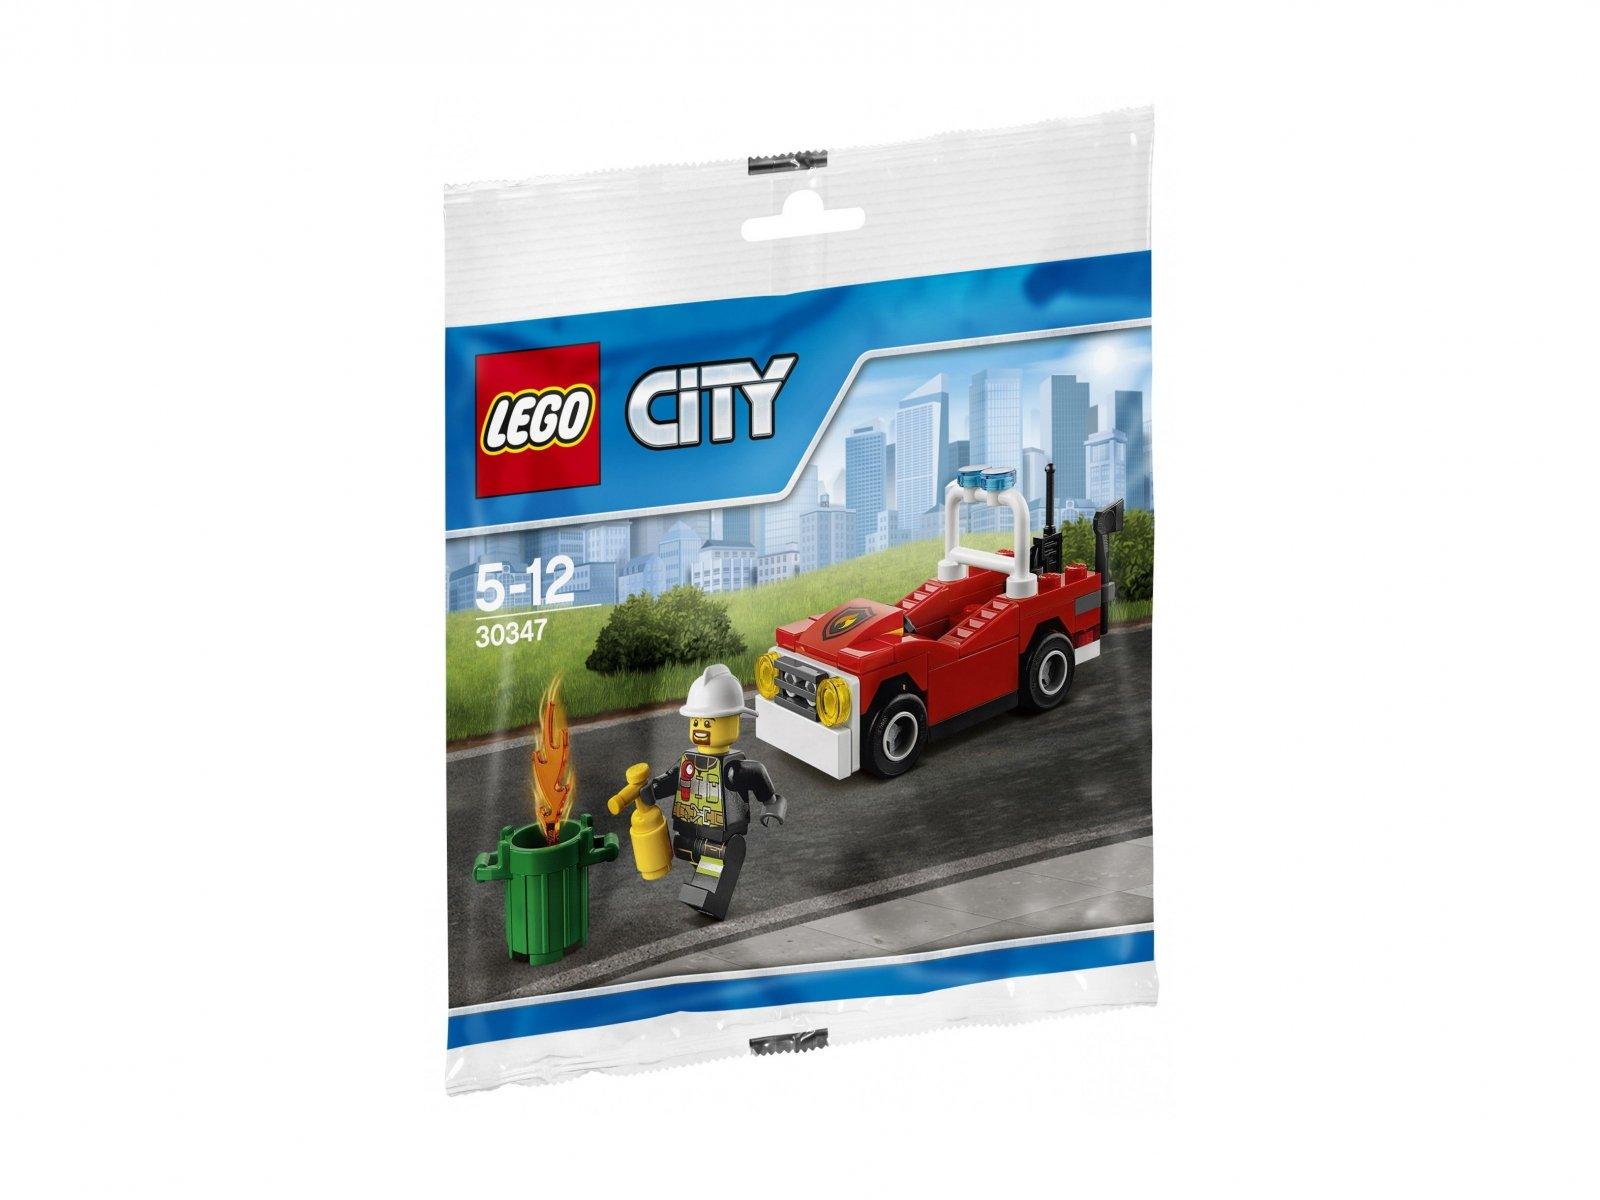 LEGO City Fire Car